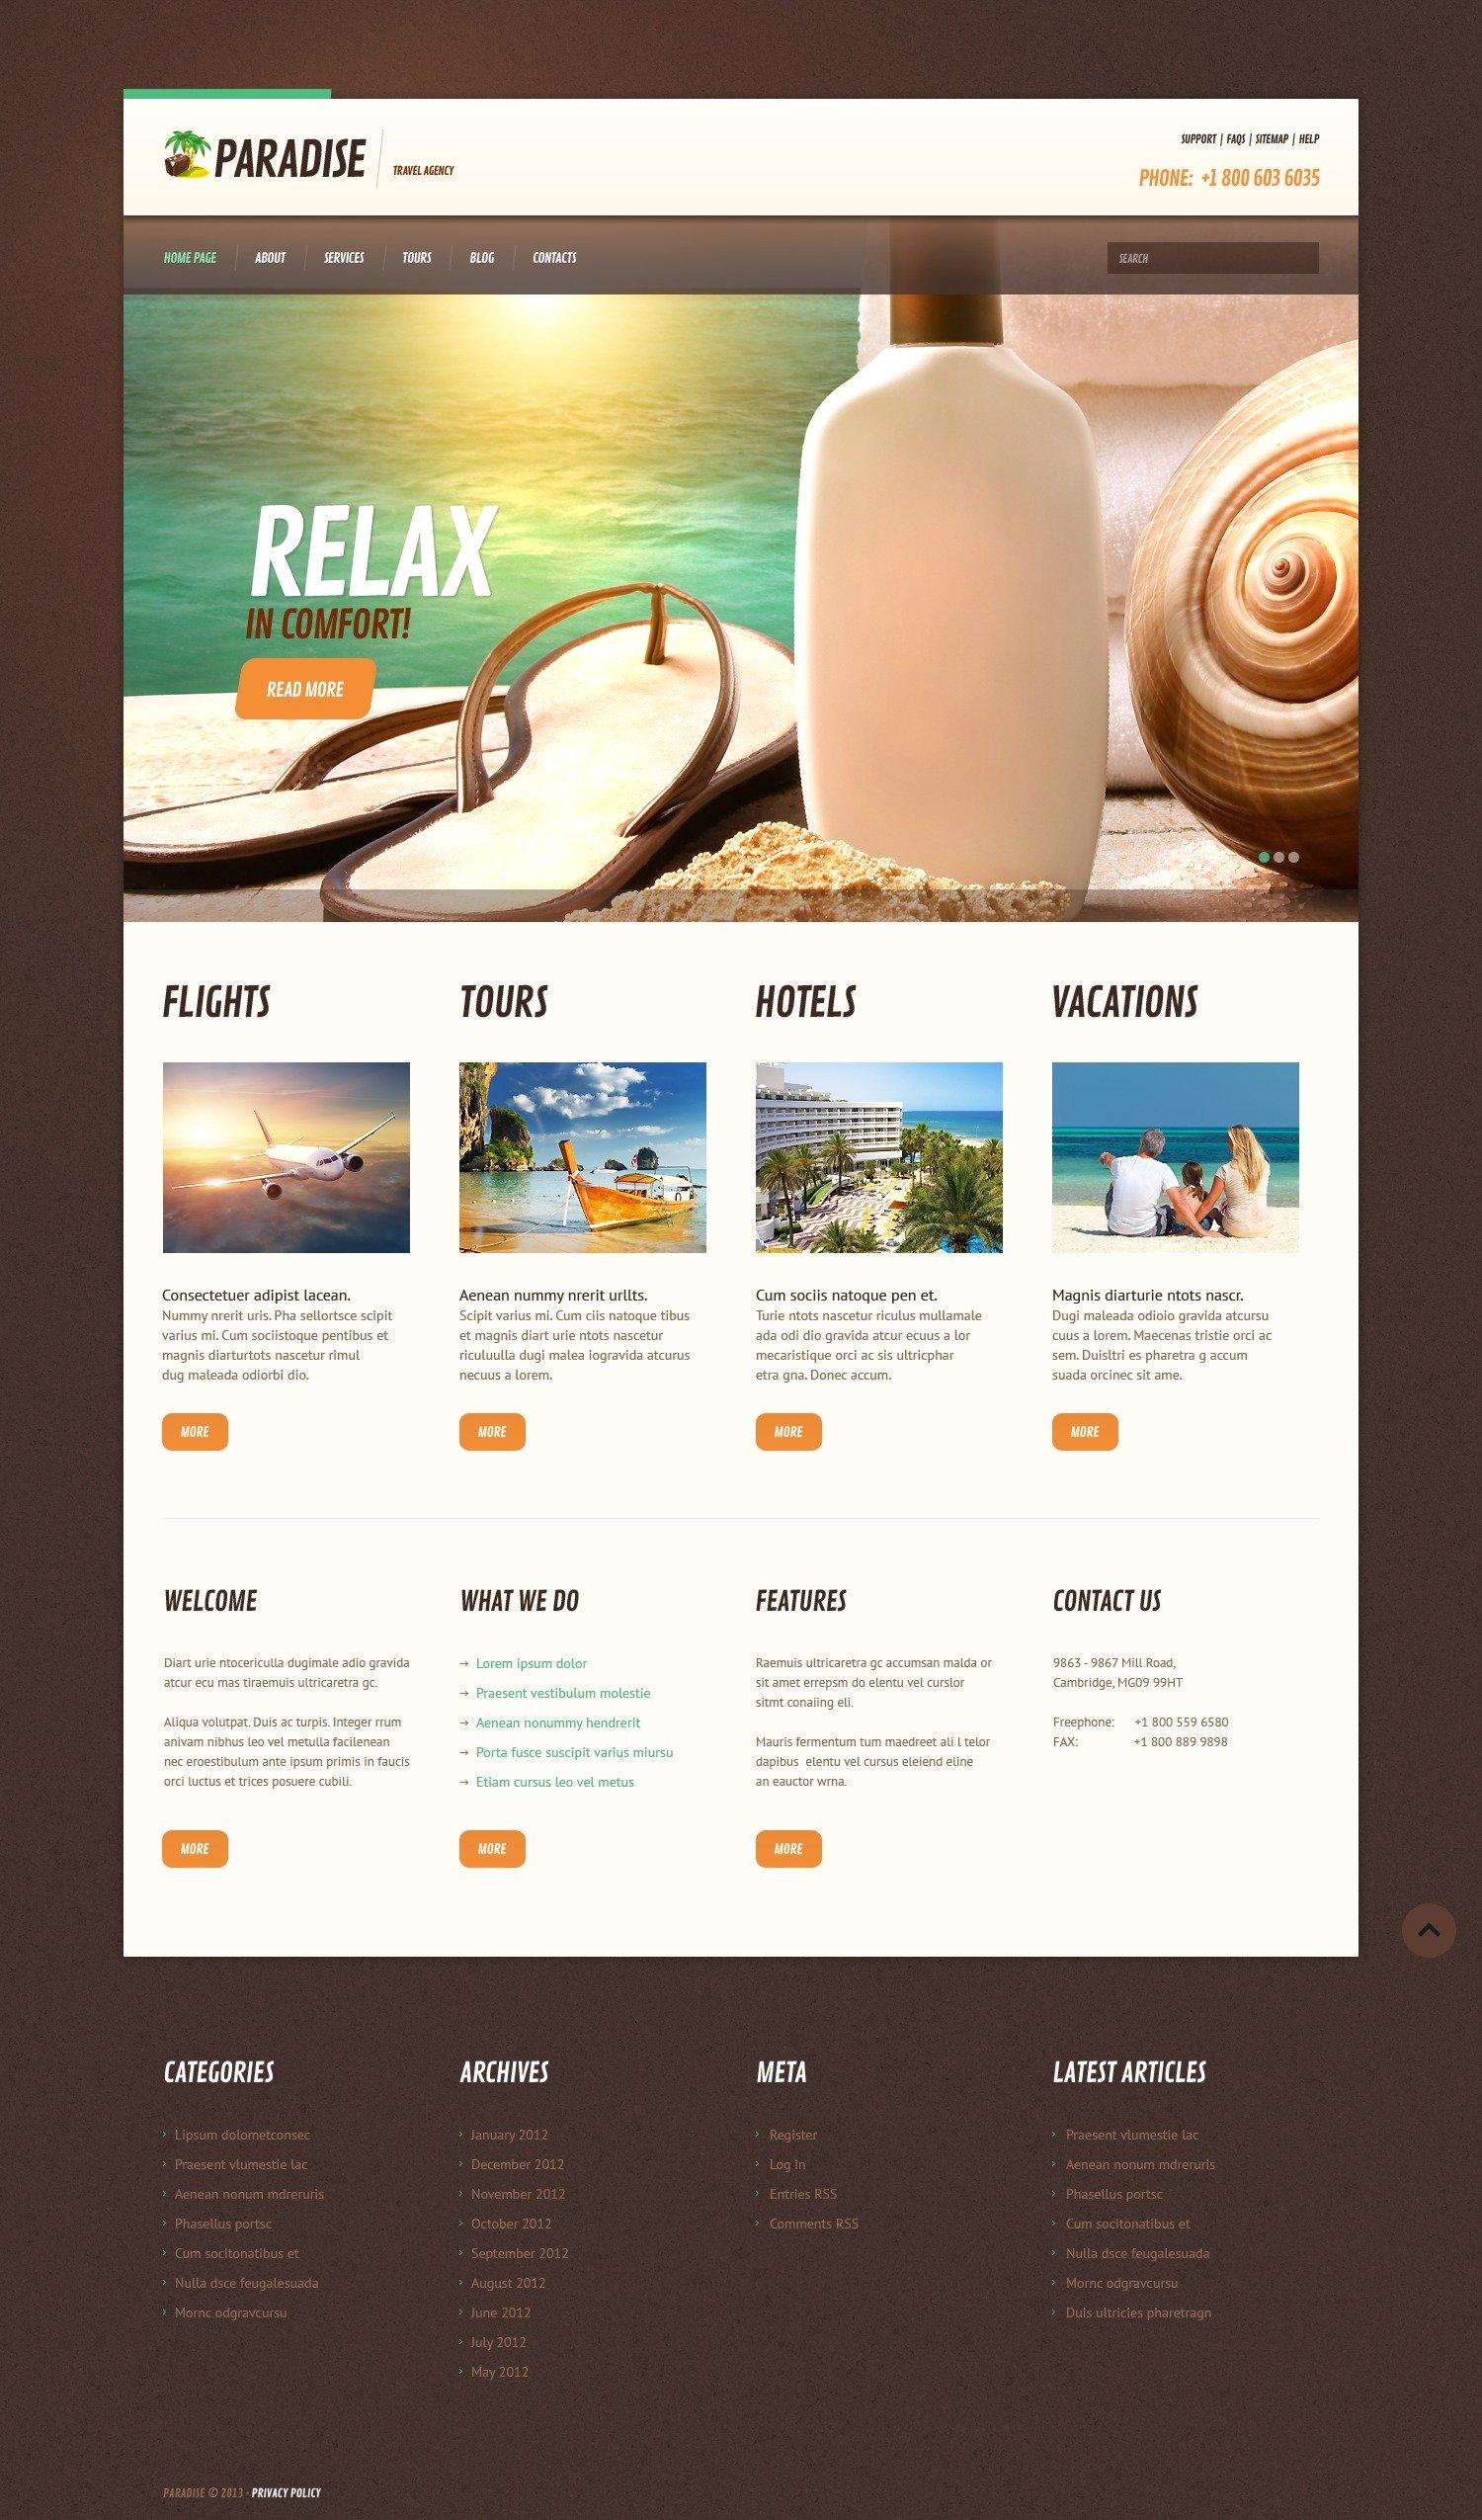 Tema De WordPress Responsive para Sitio de Agencias de viajes #44743 - captura de pantalla